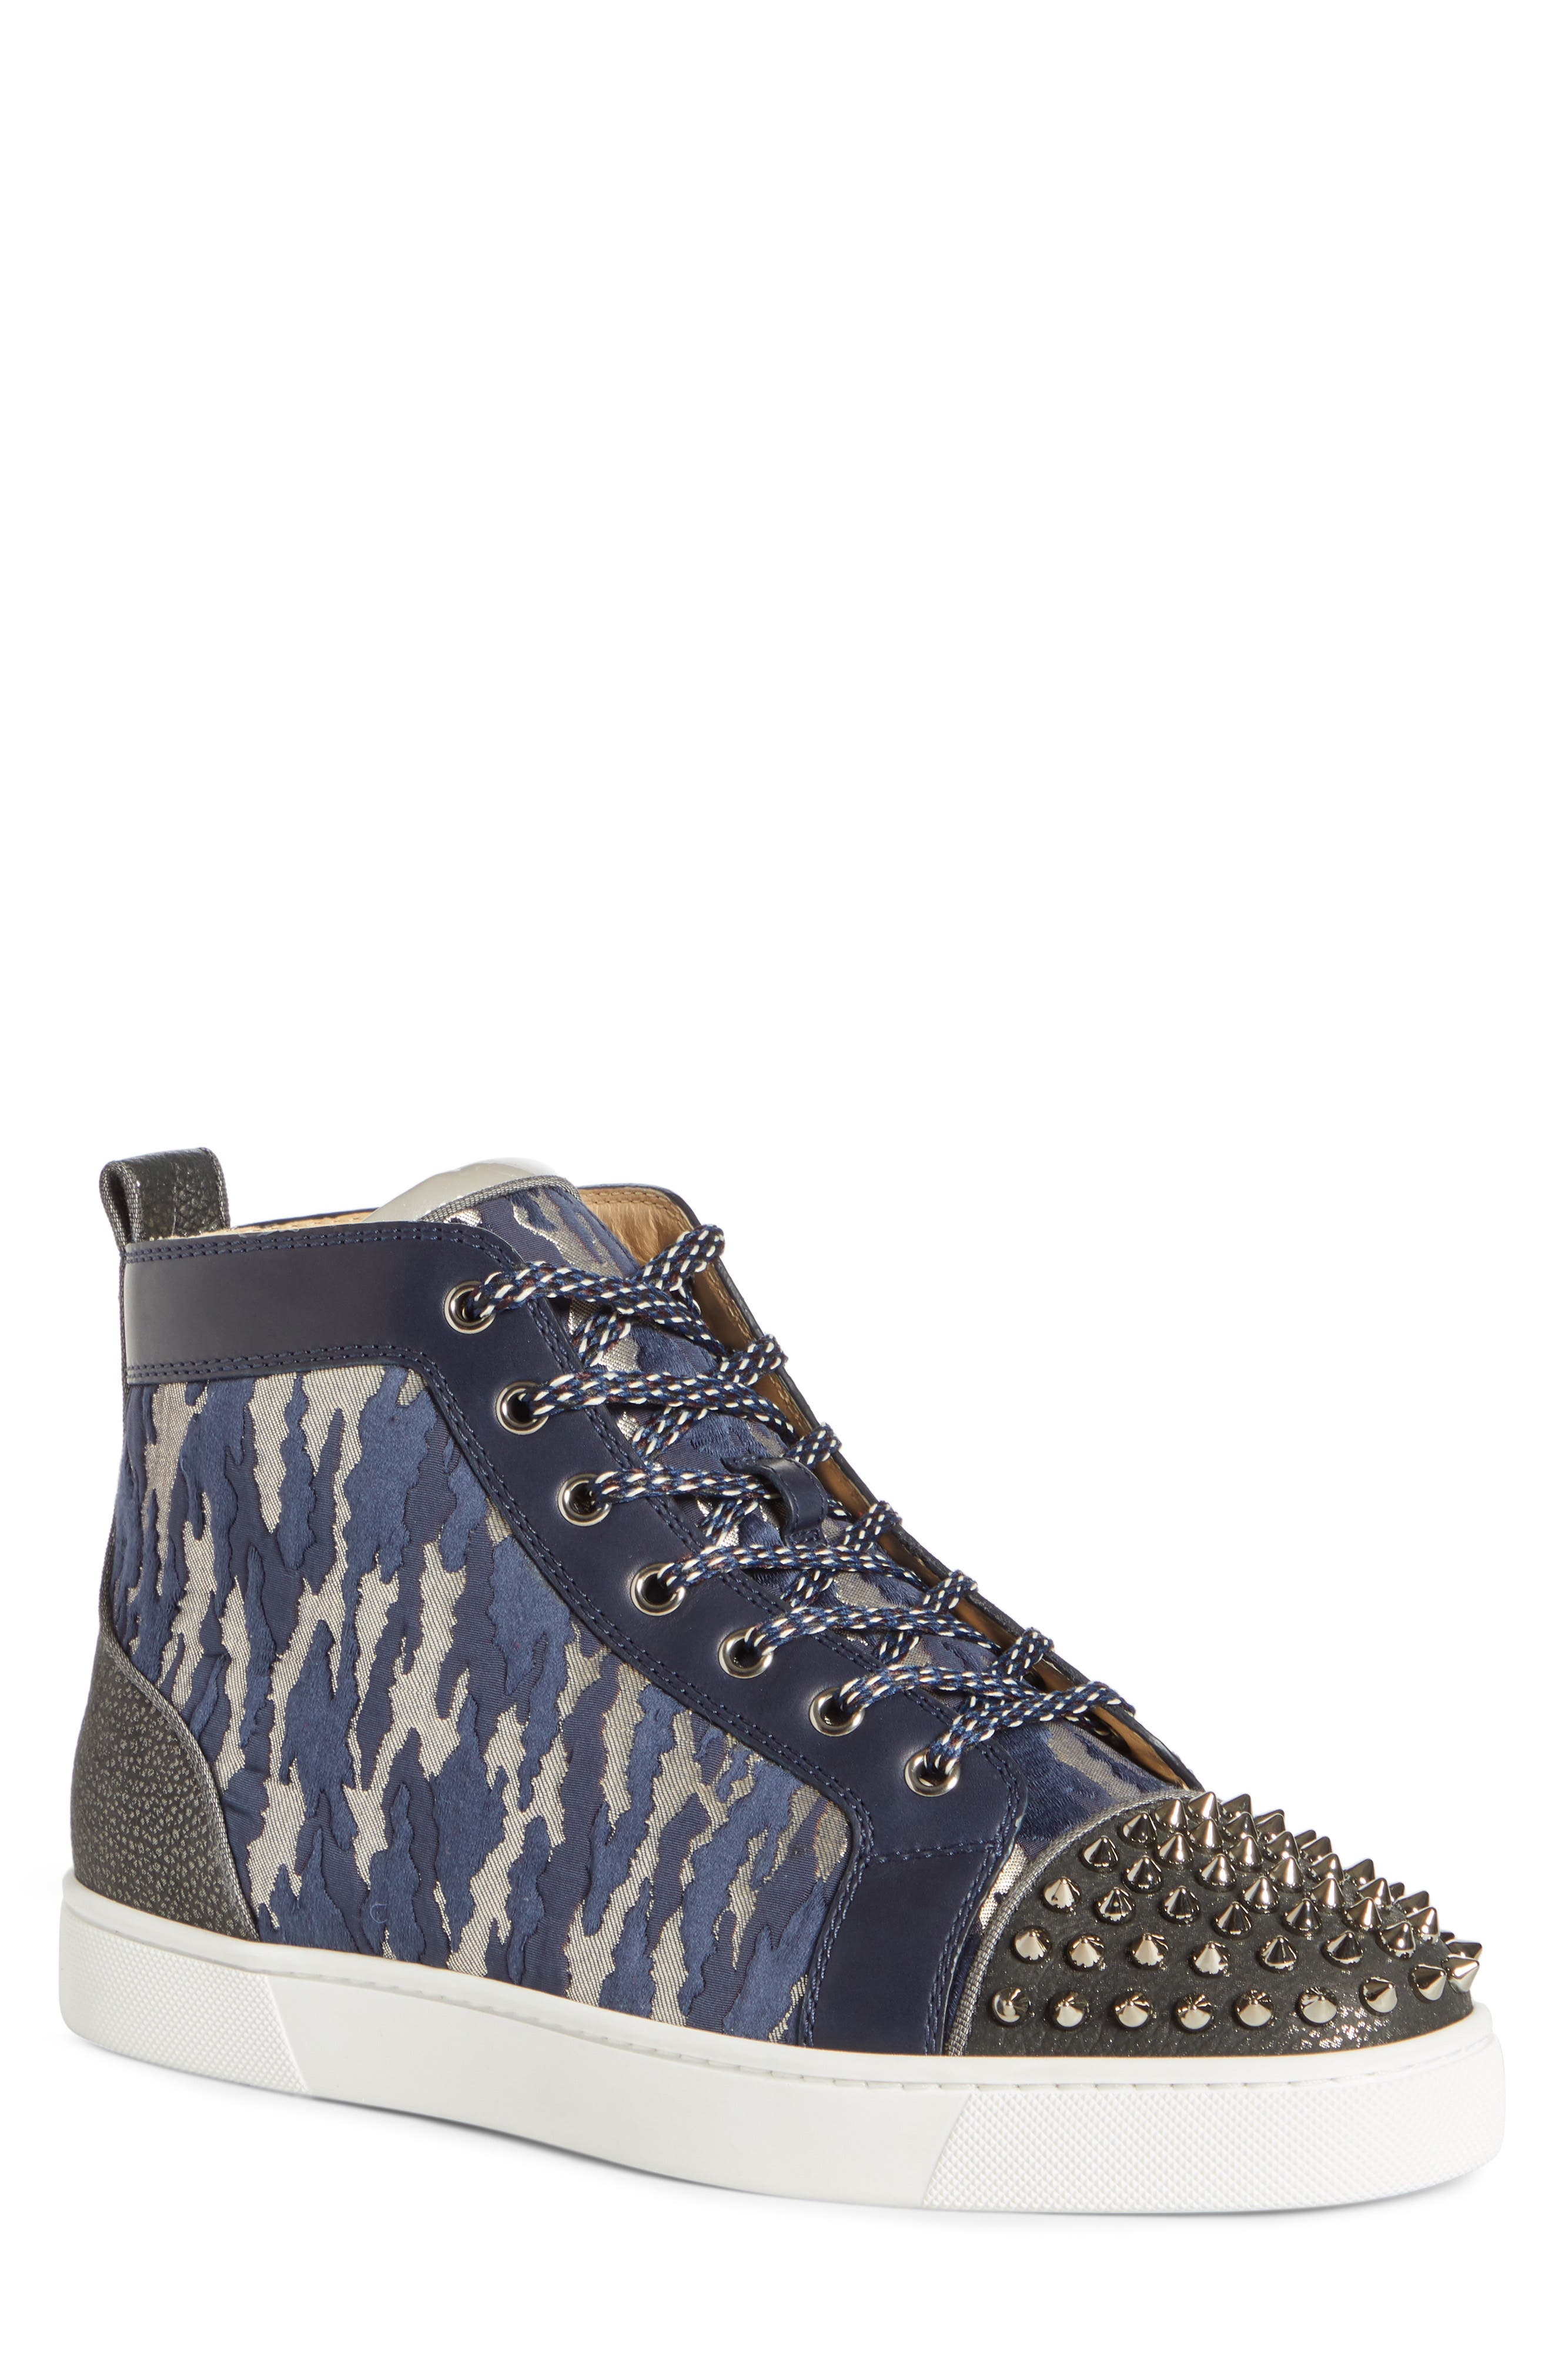 033a7e284d2 Men's Sneakers Christian Louboutin Shoes | Nordstrom